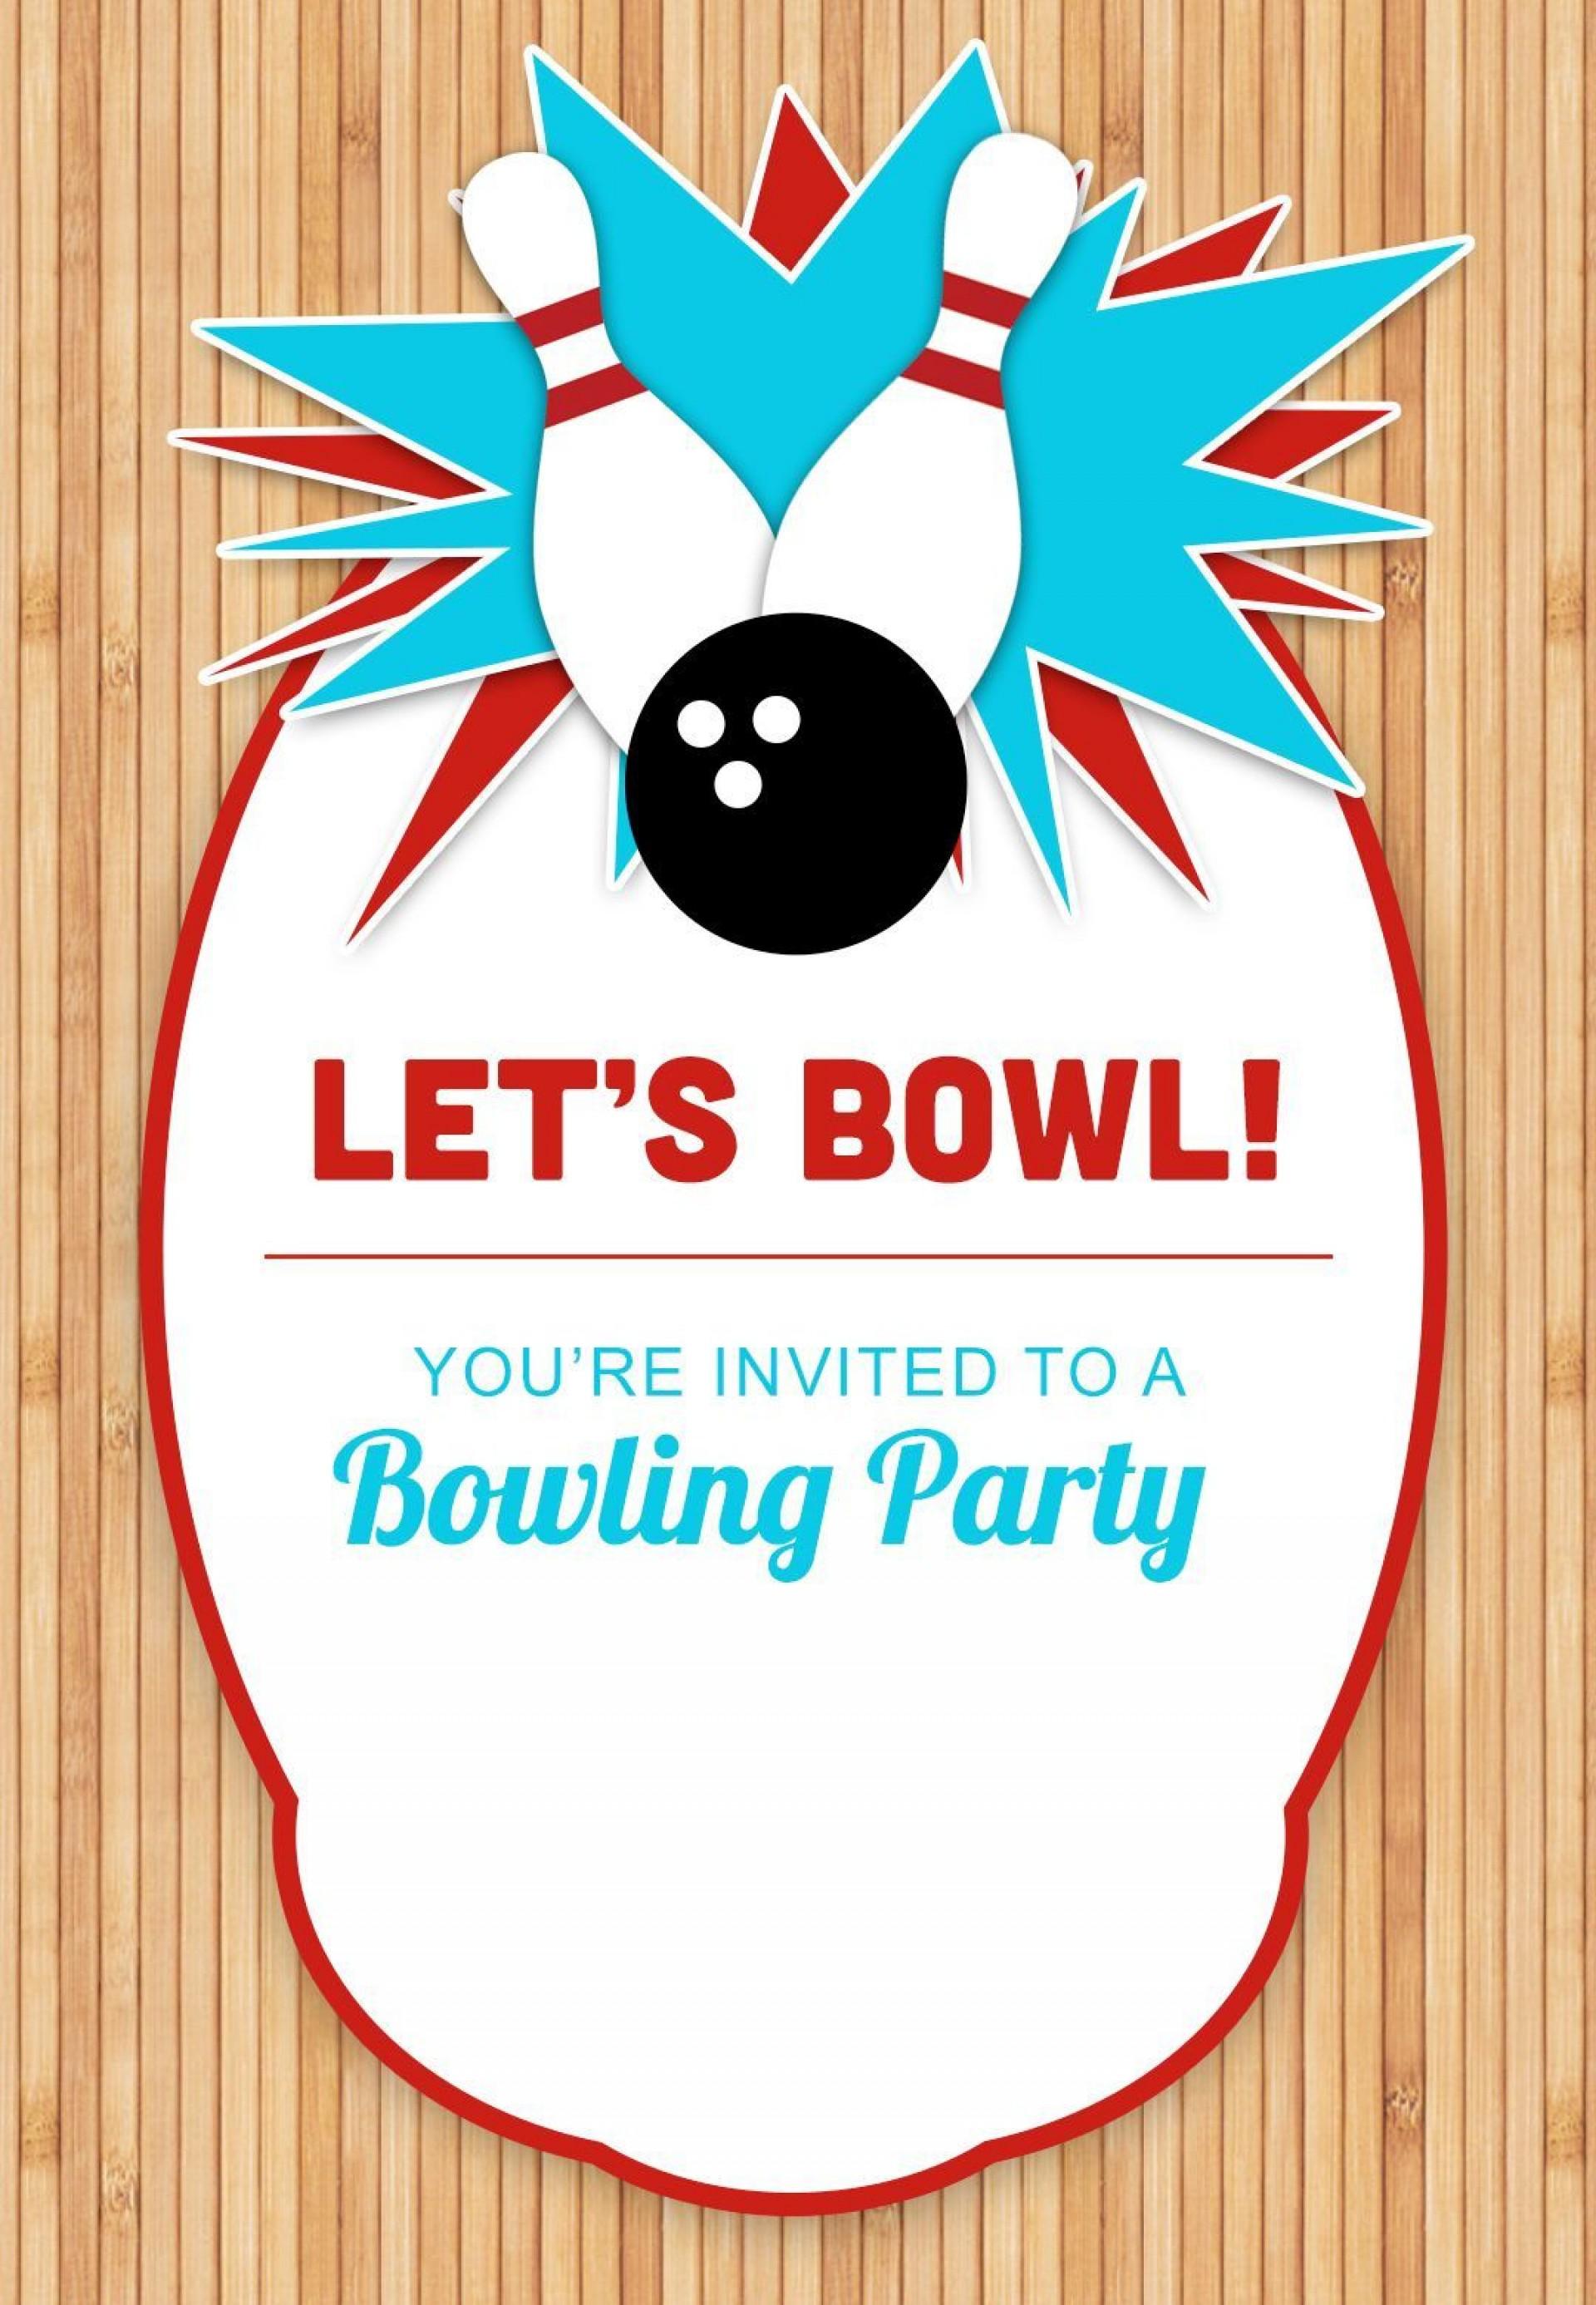 003 Marvelou Bowling Party Invite Printable Free Sample  Birthday Invitation1920